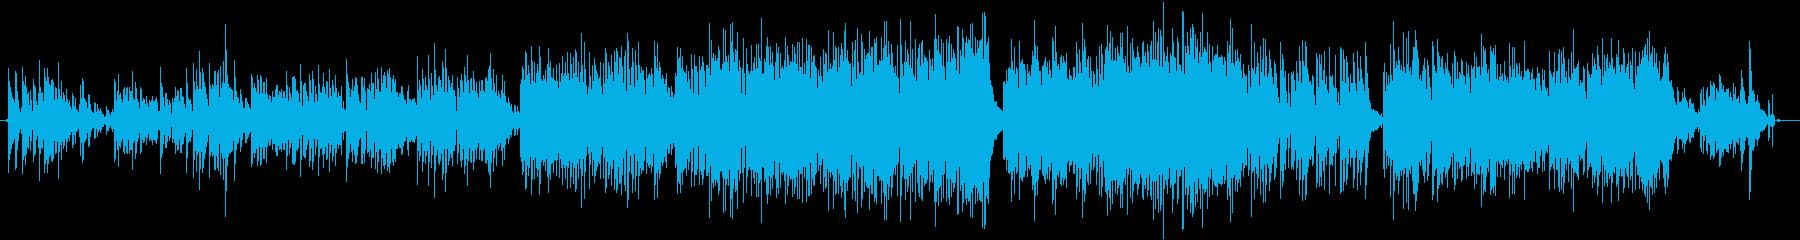 Fanoの再生済みの波形